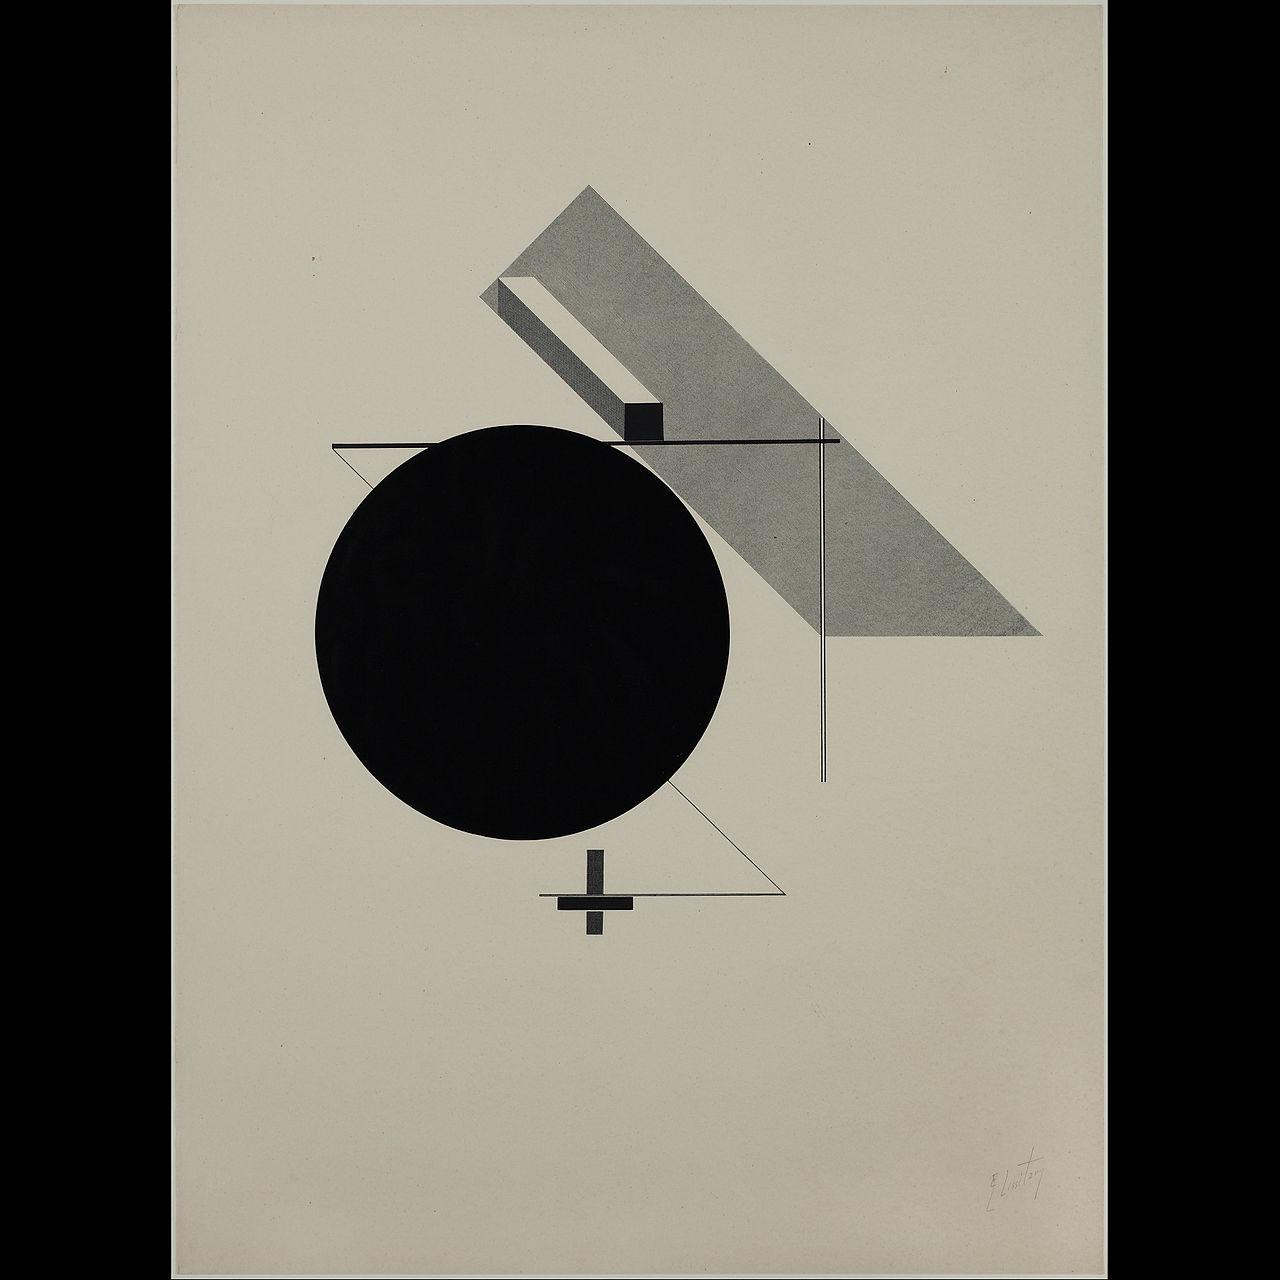 El Lissitzky,  Kestnermappe Proun , 1923, Berardo Collection Museum, Lisbon.